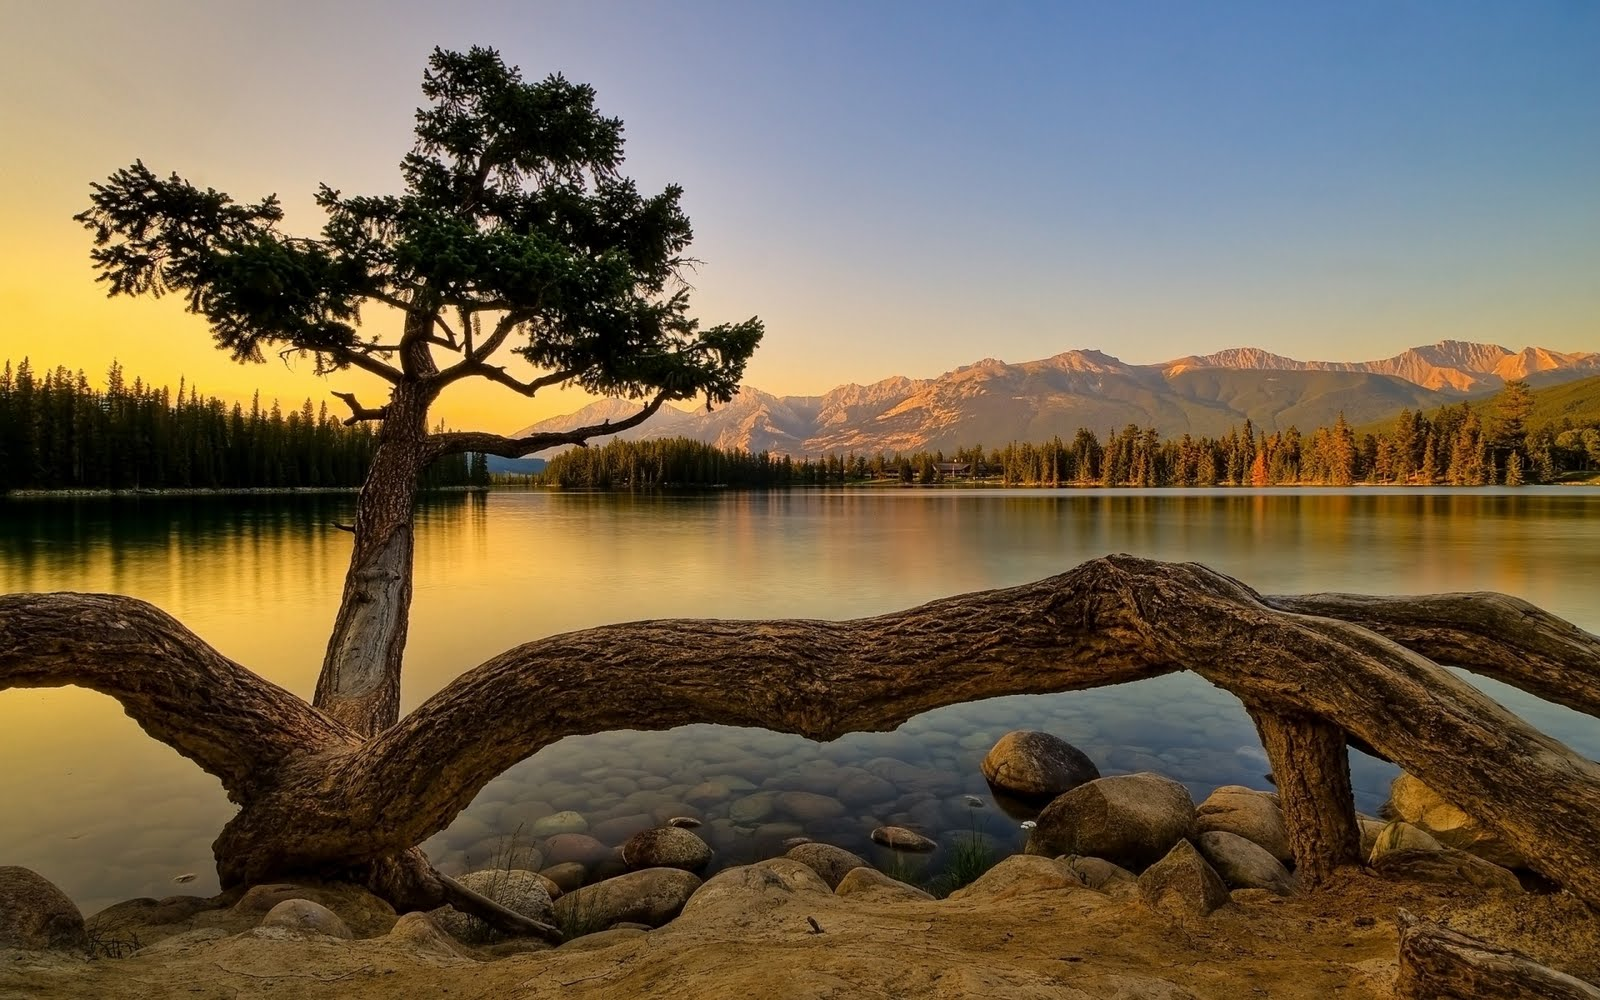 Paisaje de verano - Superb summer landscape